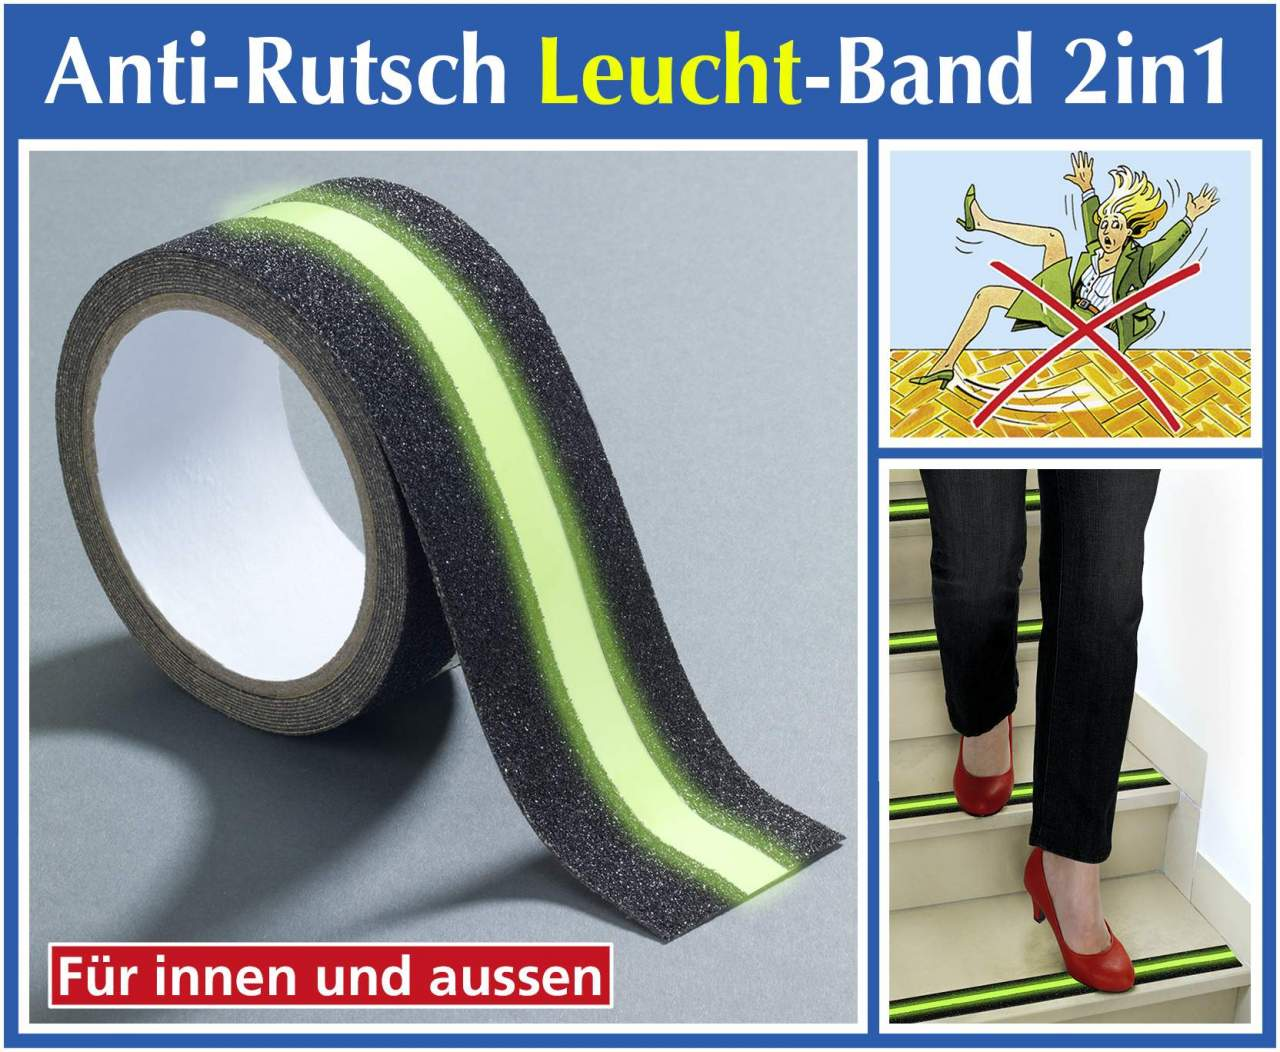 Anti-Rutsch-Leuchtband 2 in 1